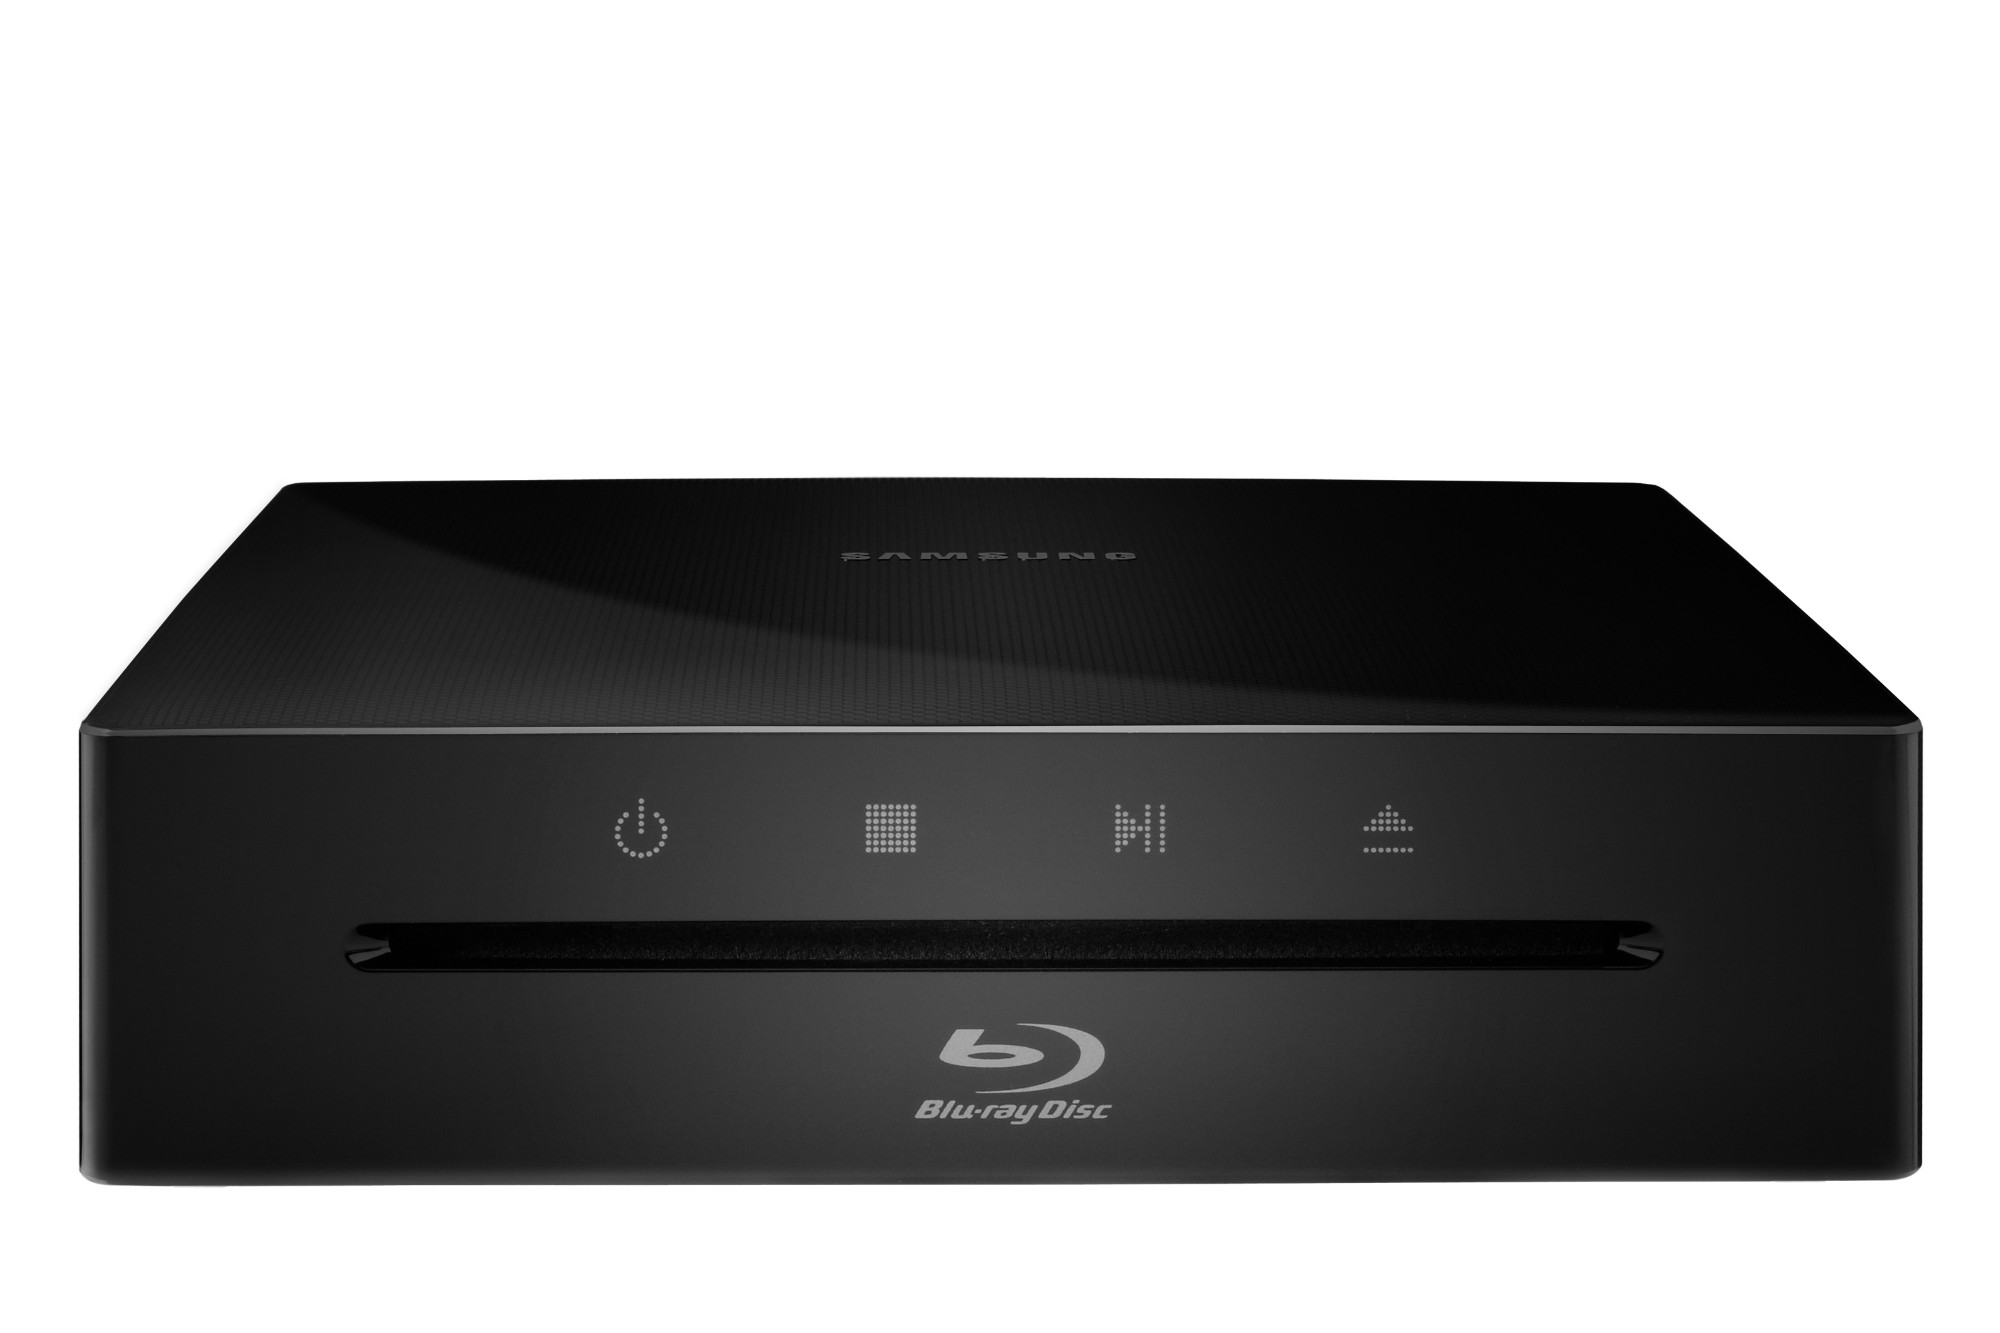 Samsung BD-ES5000 Blu-Ray player Black, 0 in distributor ...